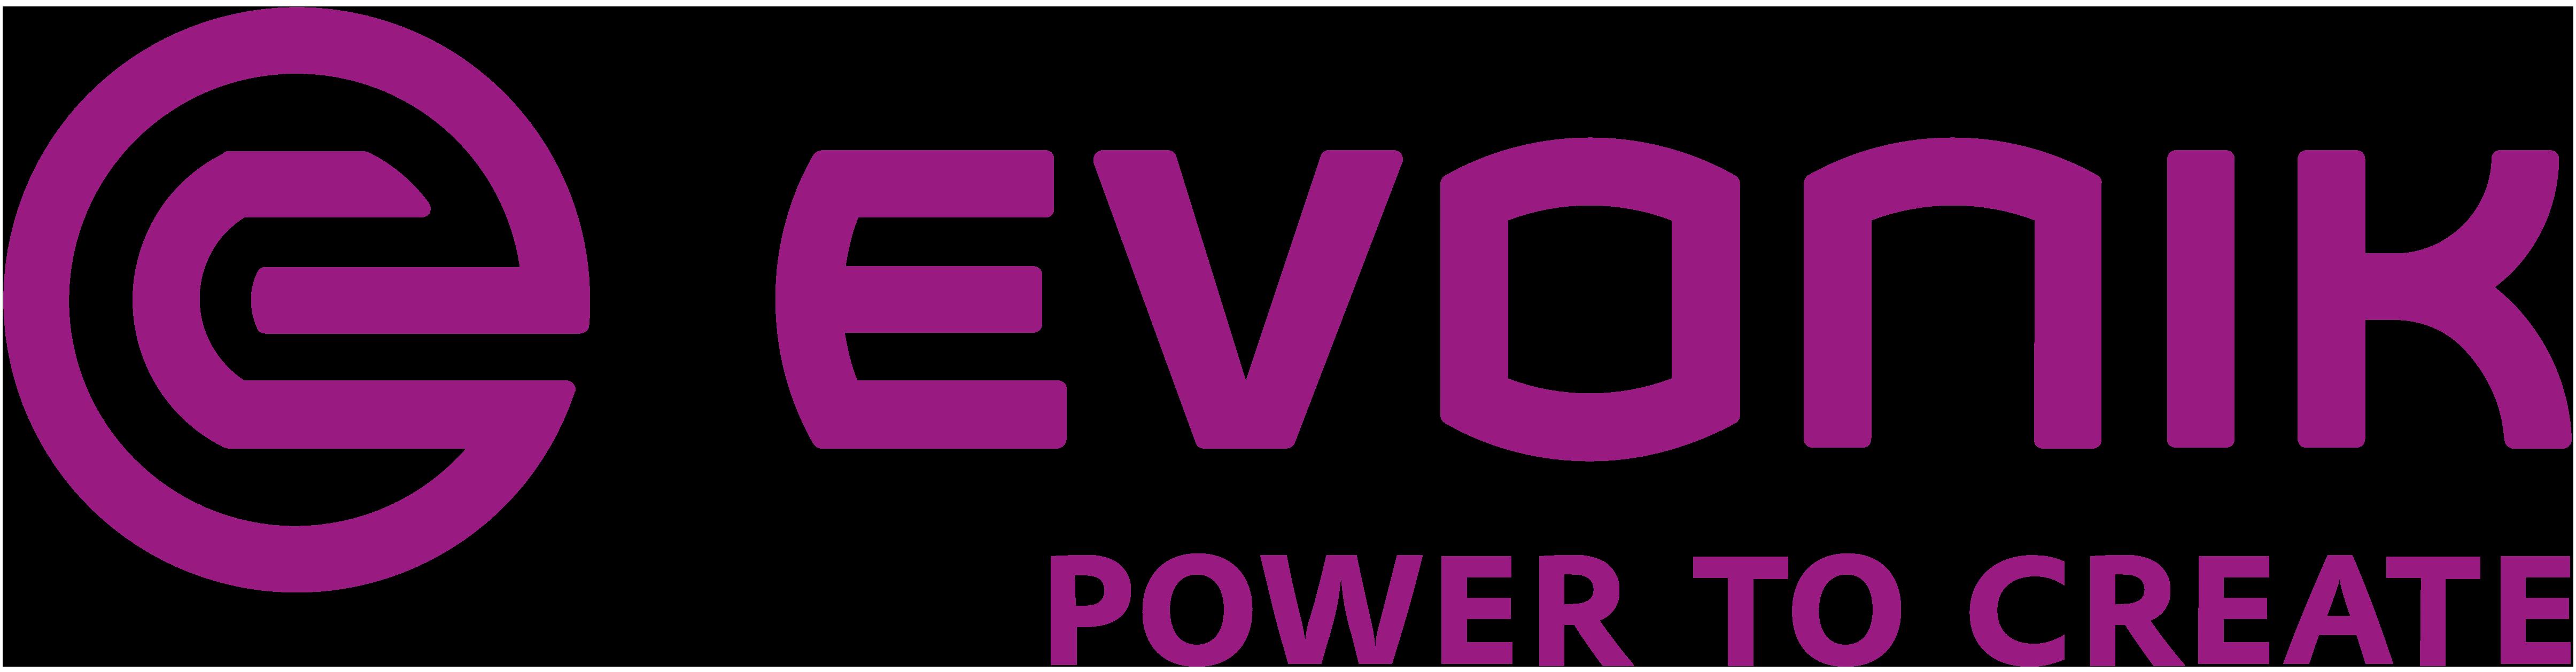 evonik industries logos download chevrolet logo vector 2015 chevrolet logo vector download